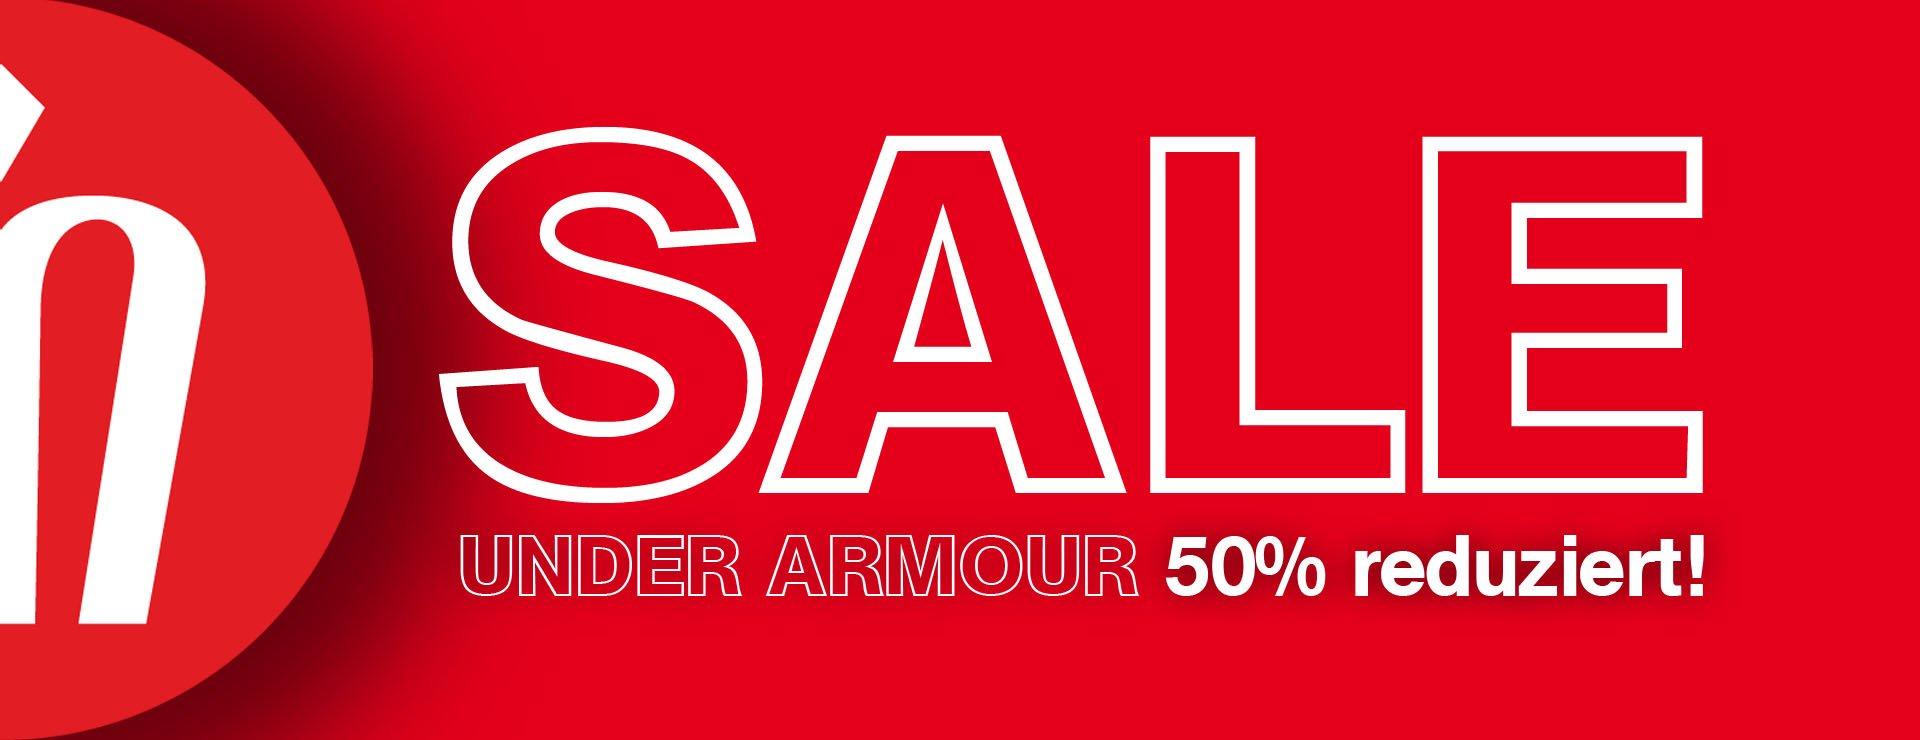 lightbox_sale